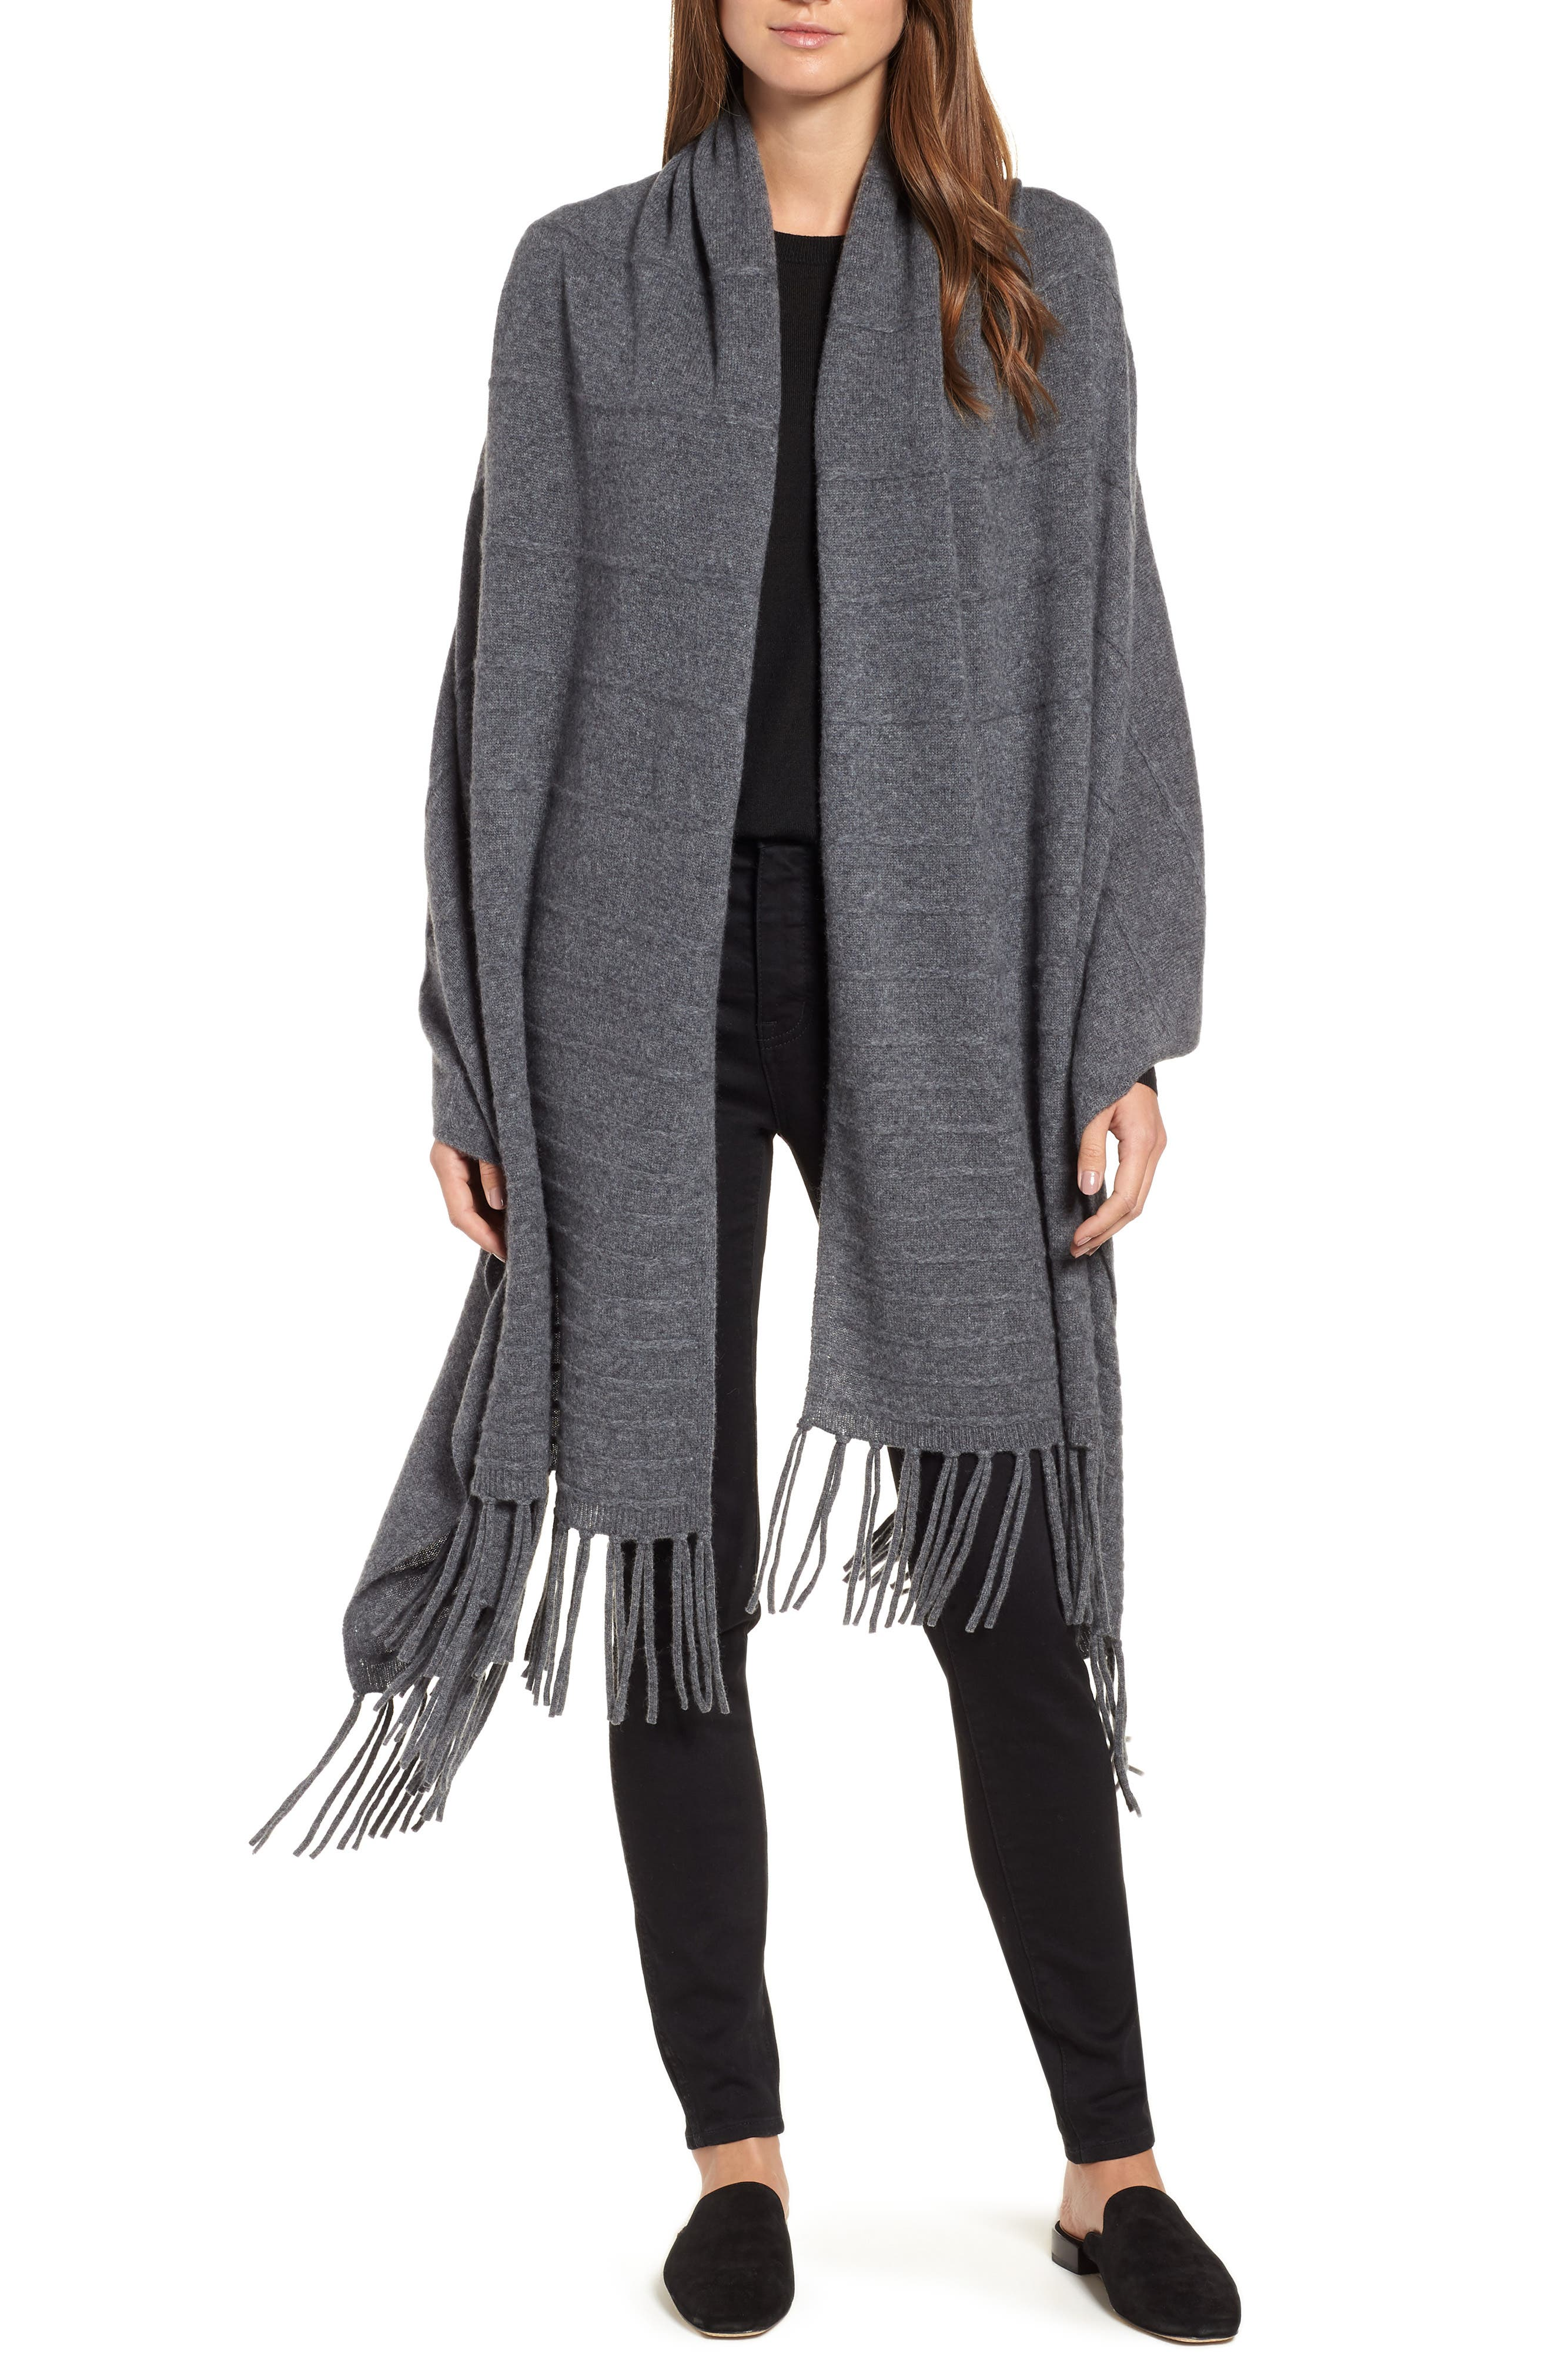 Cashmere Wrap,                         Main,                         color, GREY DARK HEATHER